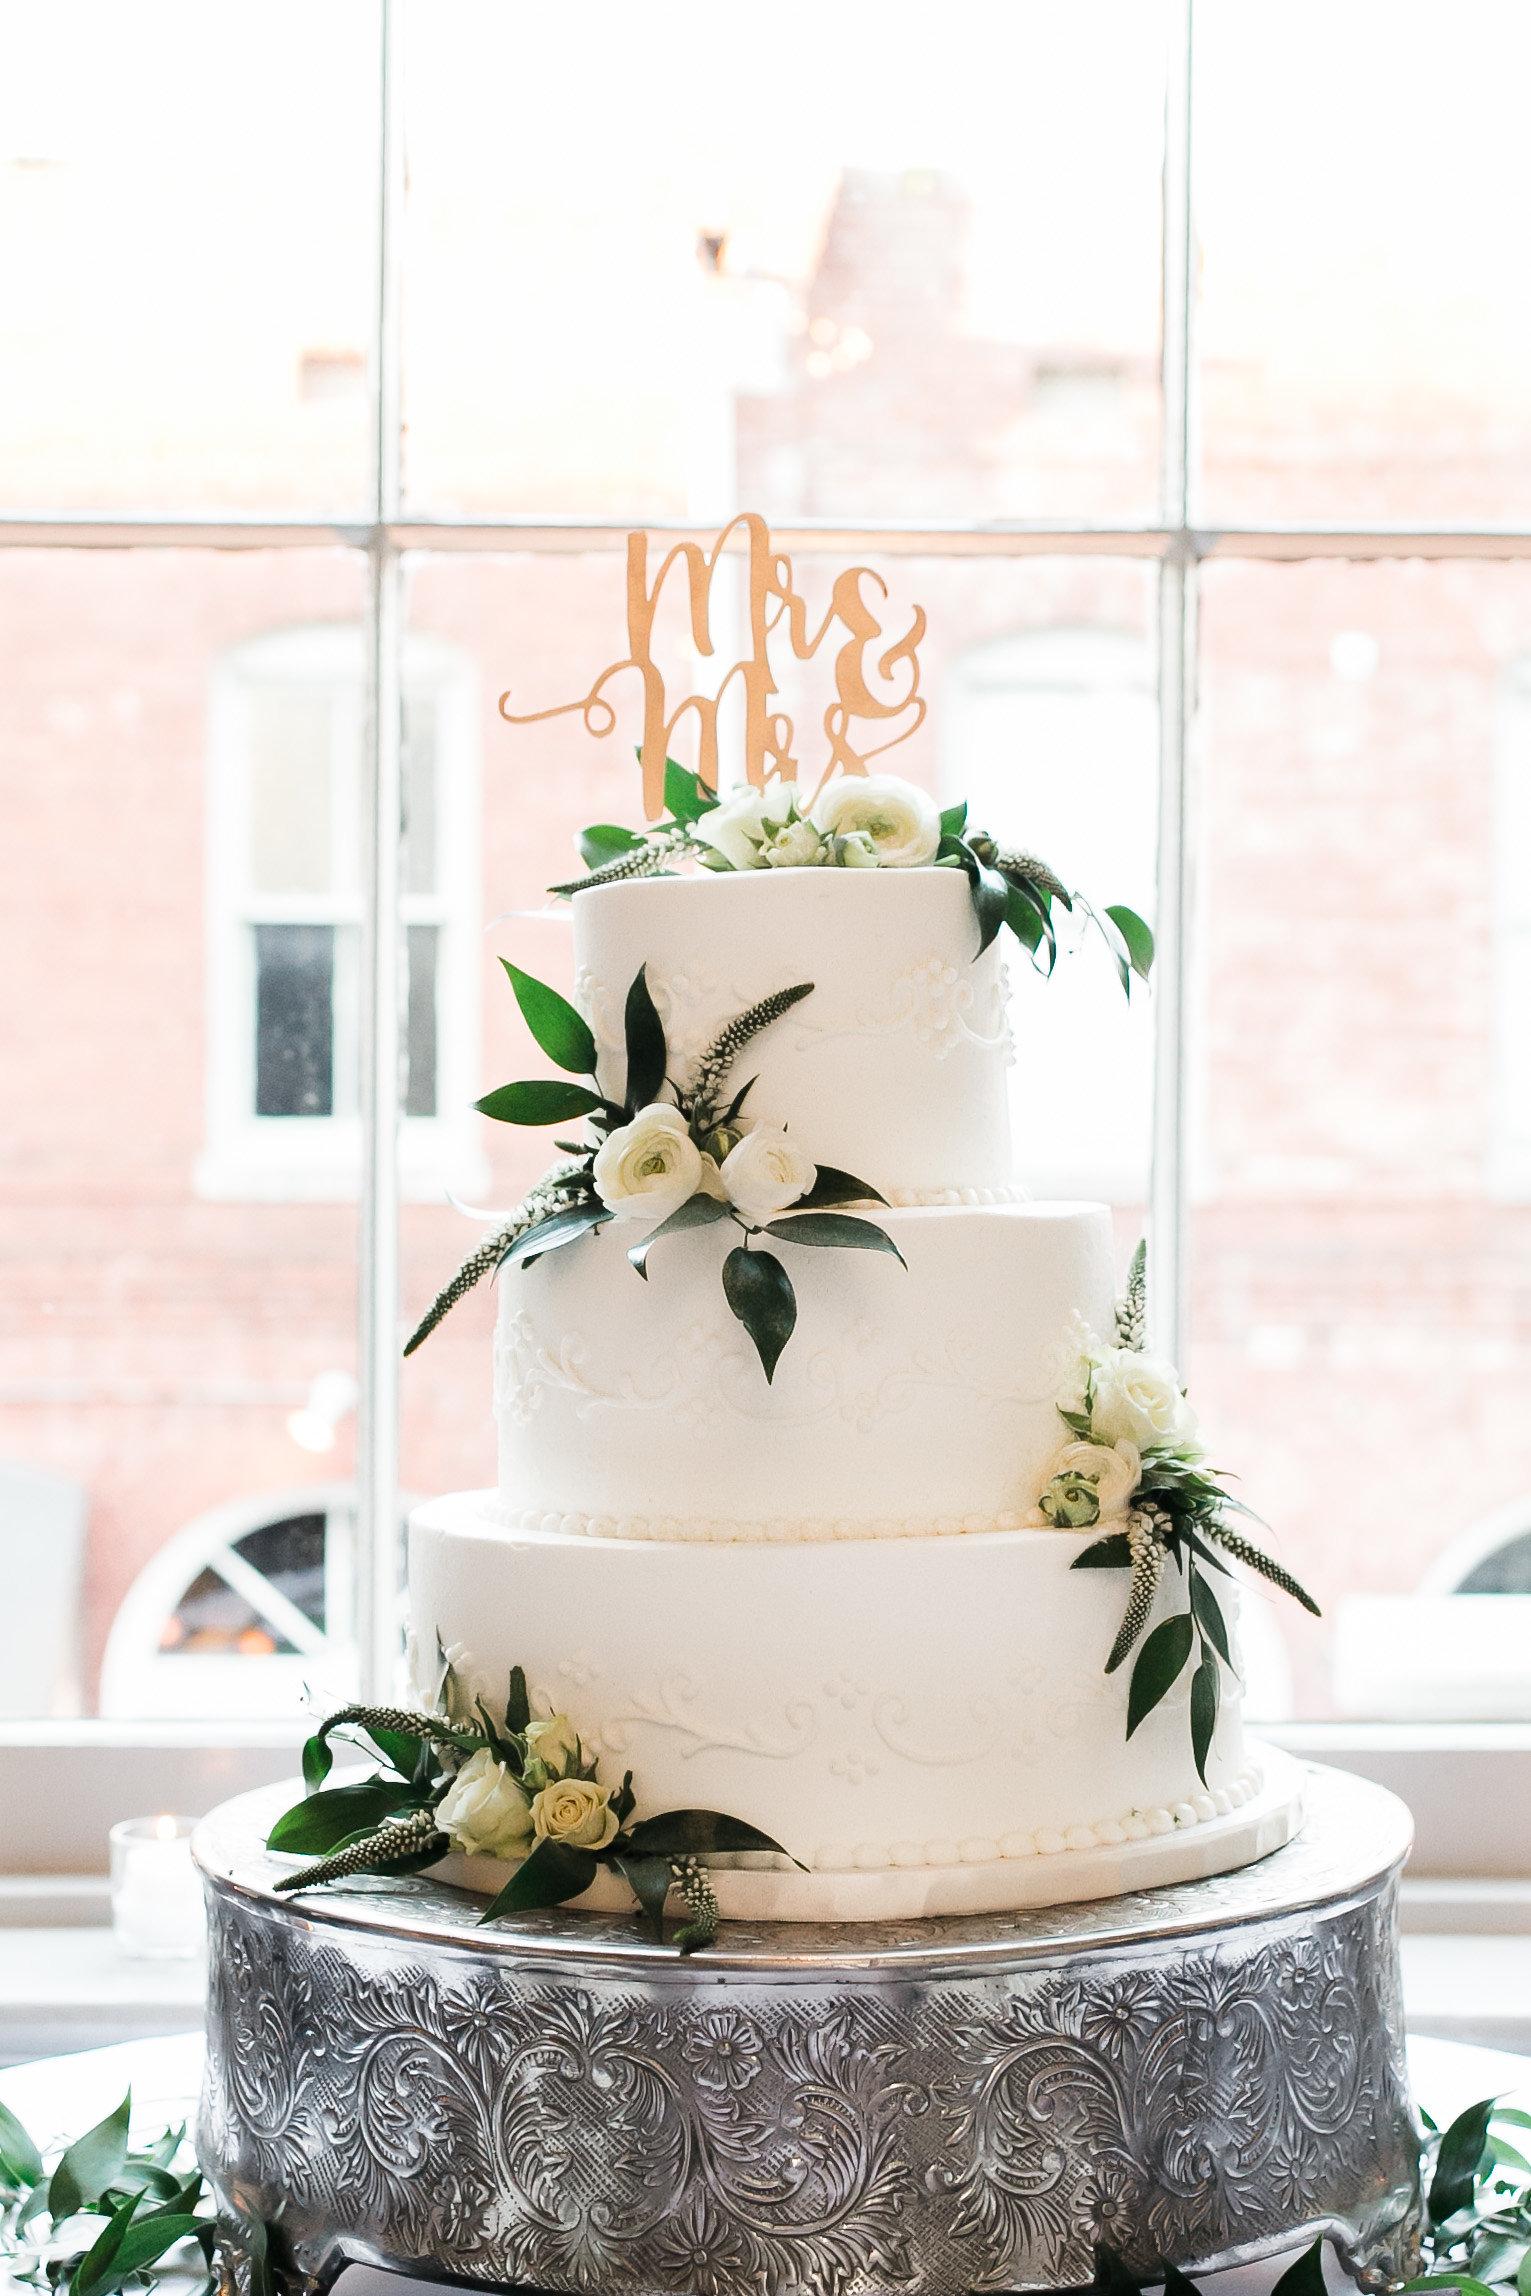 Elegant White wedding cake at Garibaldi Cafe